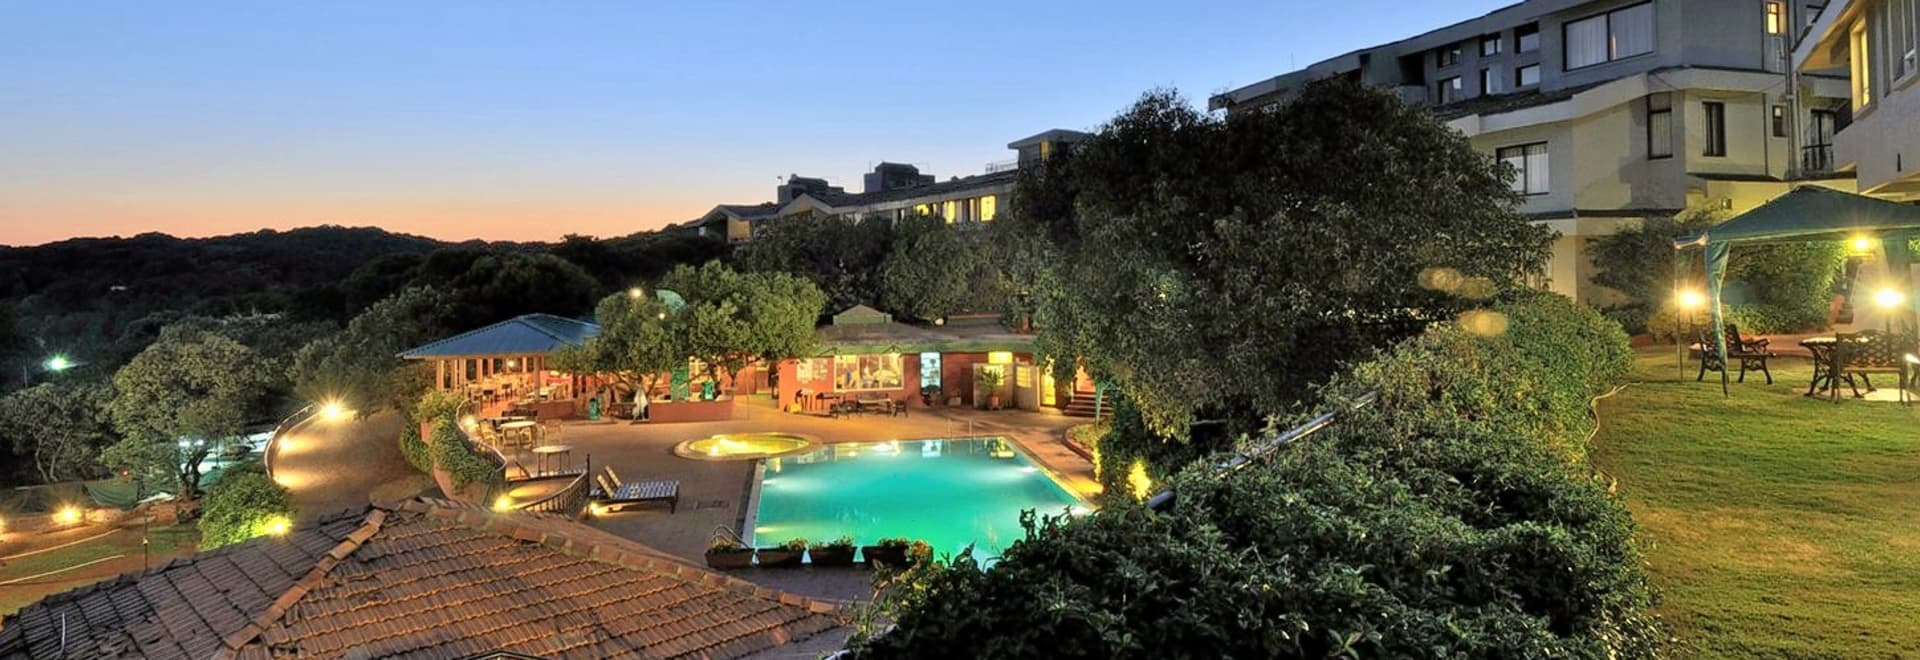 Best Resorts Near Pune - Top 10 destinations around the world for homestays